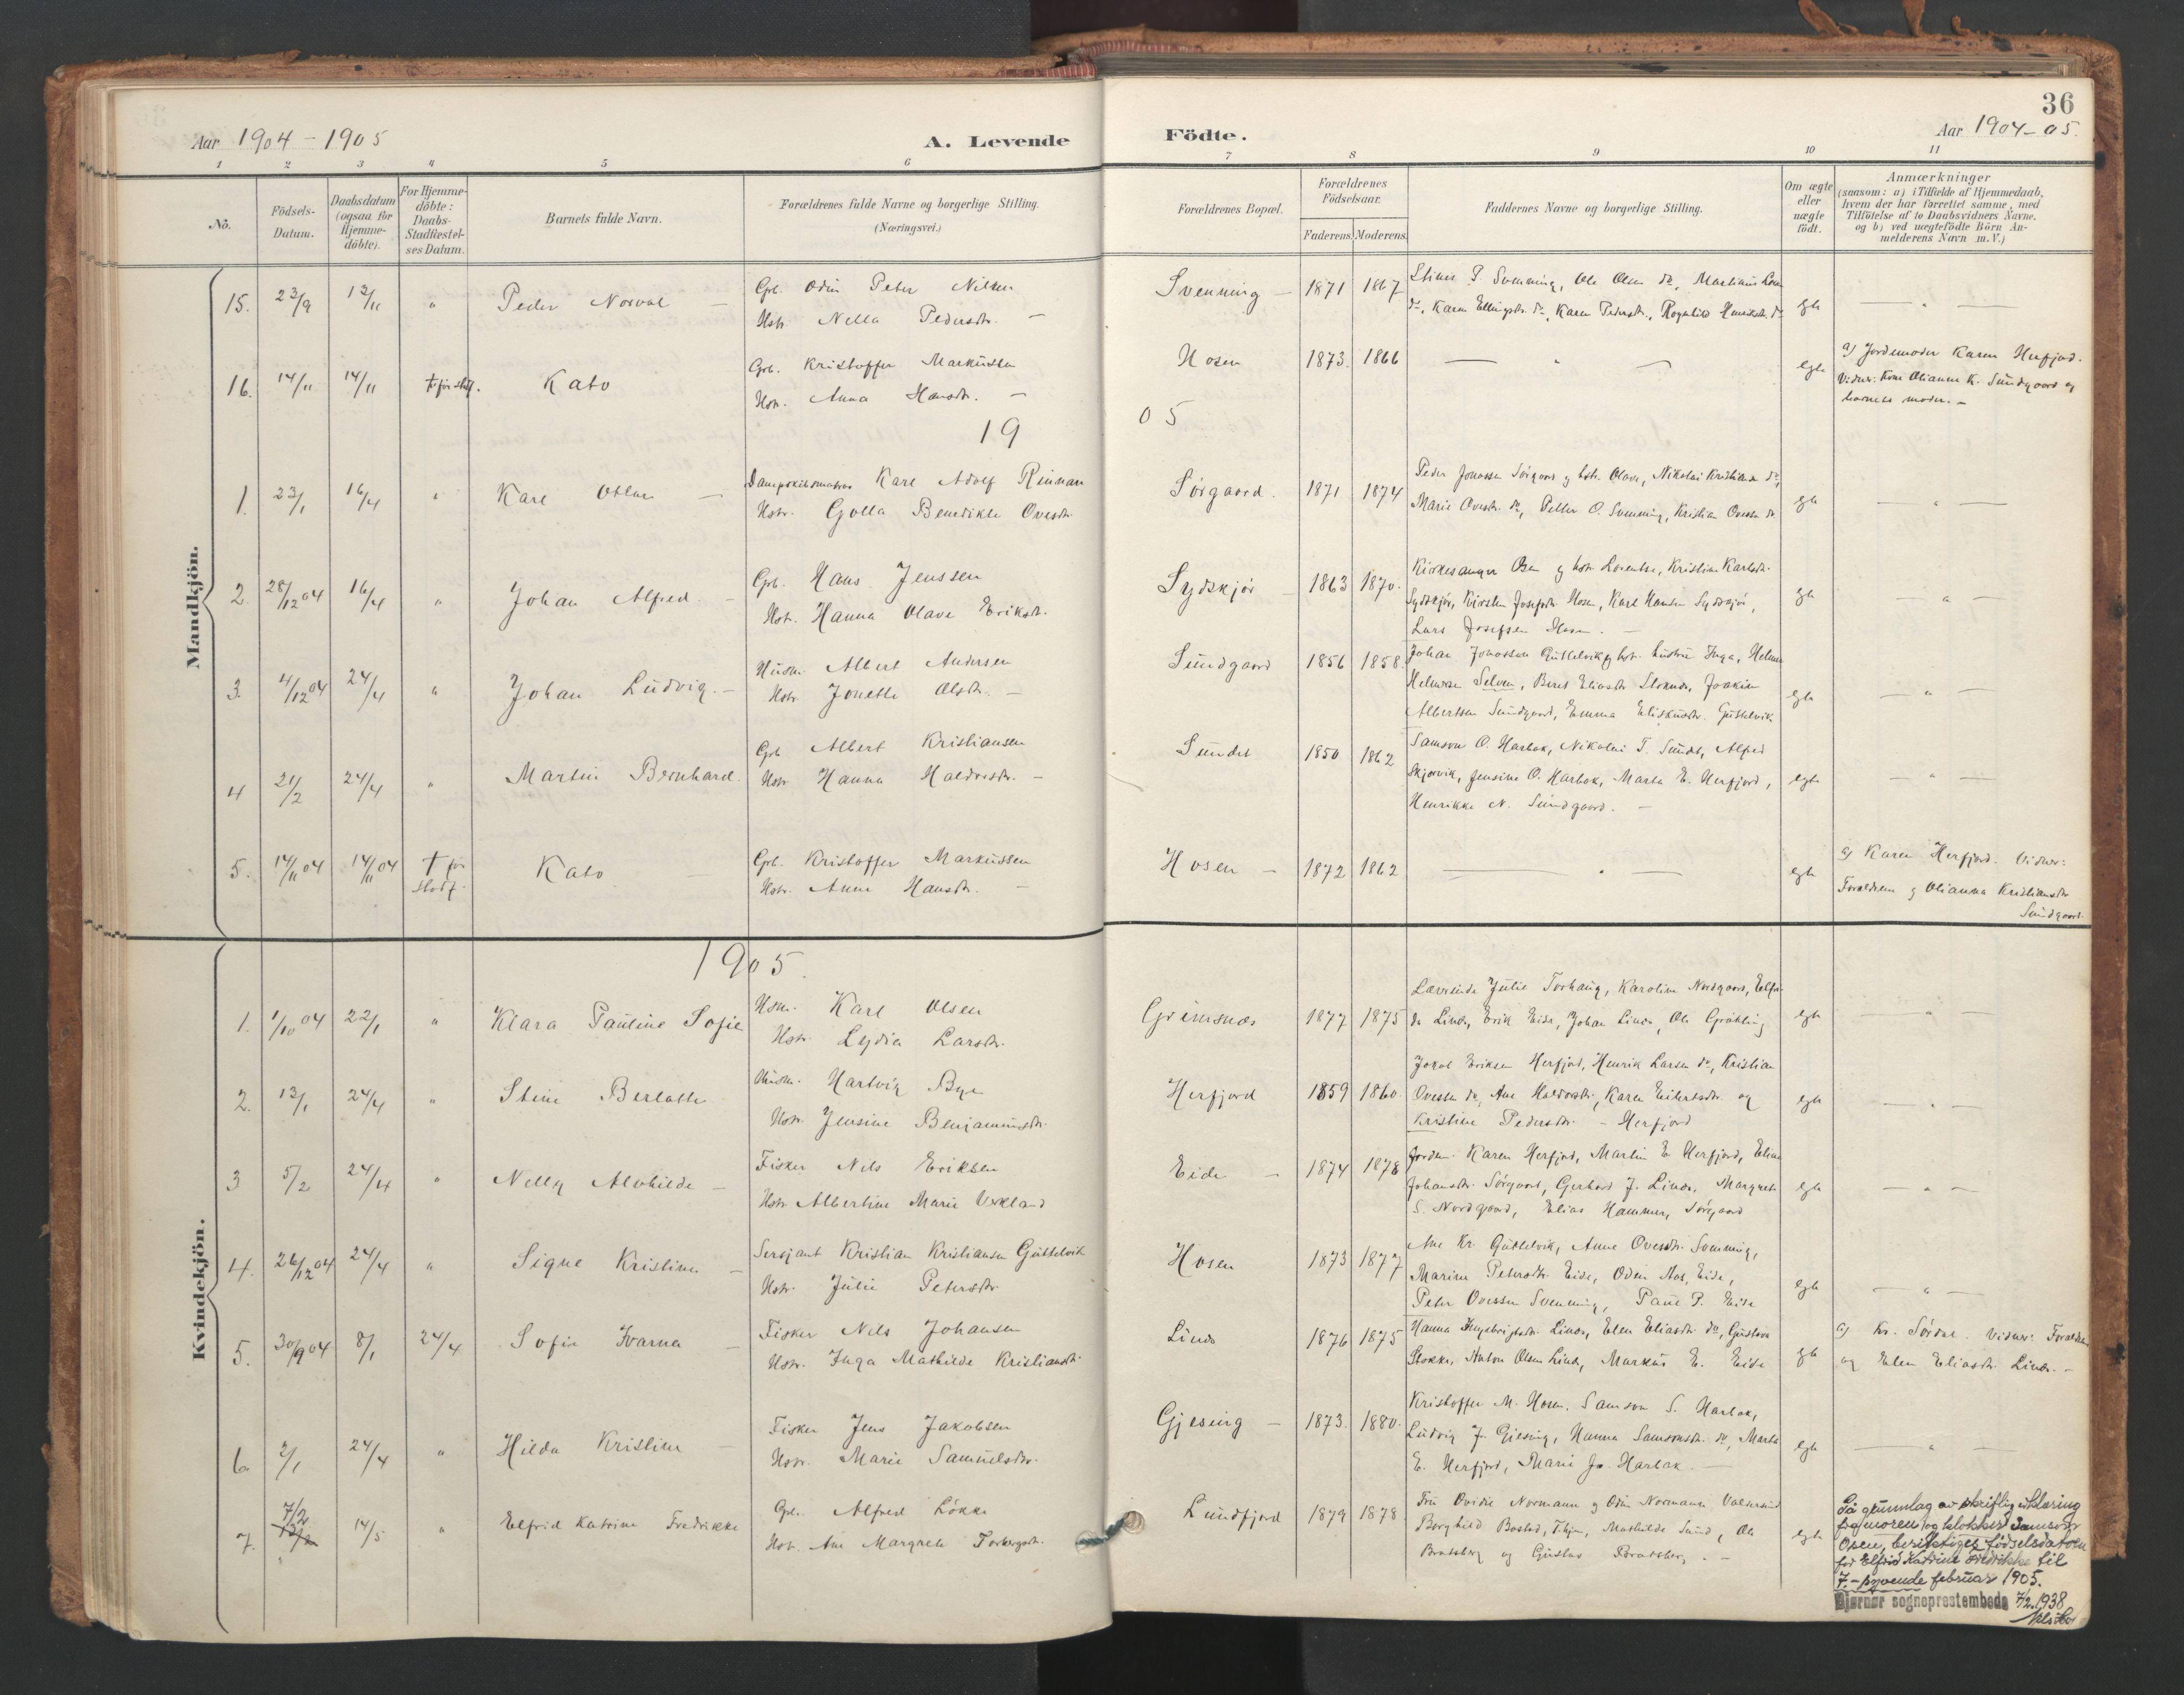 SAT, Ministerialprotokoller, klokkerbøker og fødselsregistre - Sør-Trøndelag, 656/L0693: Parish register (official) no. 656A02, 1894-1913, p. 36